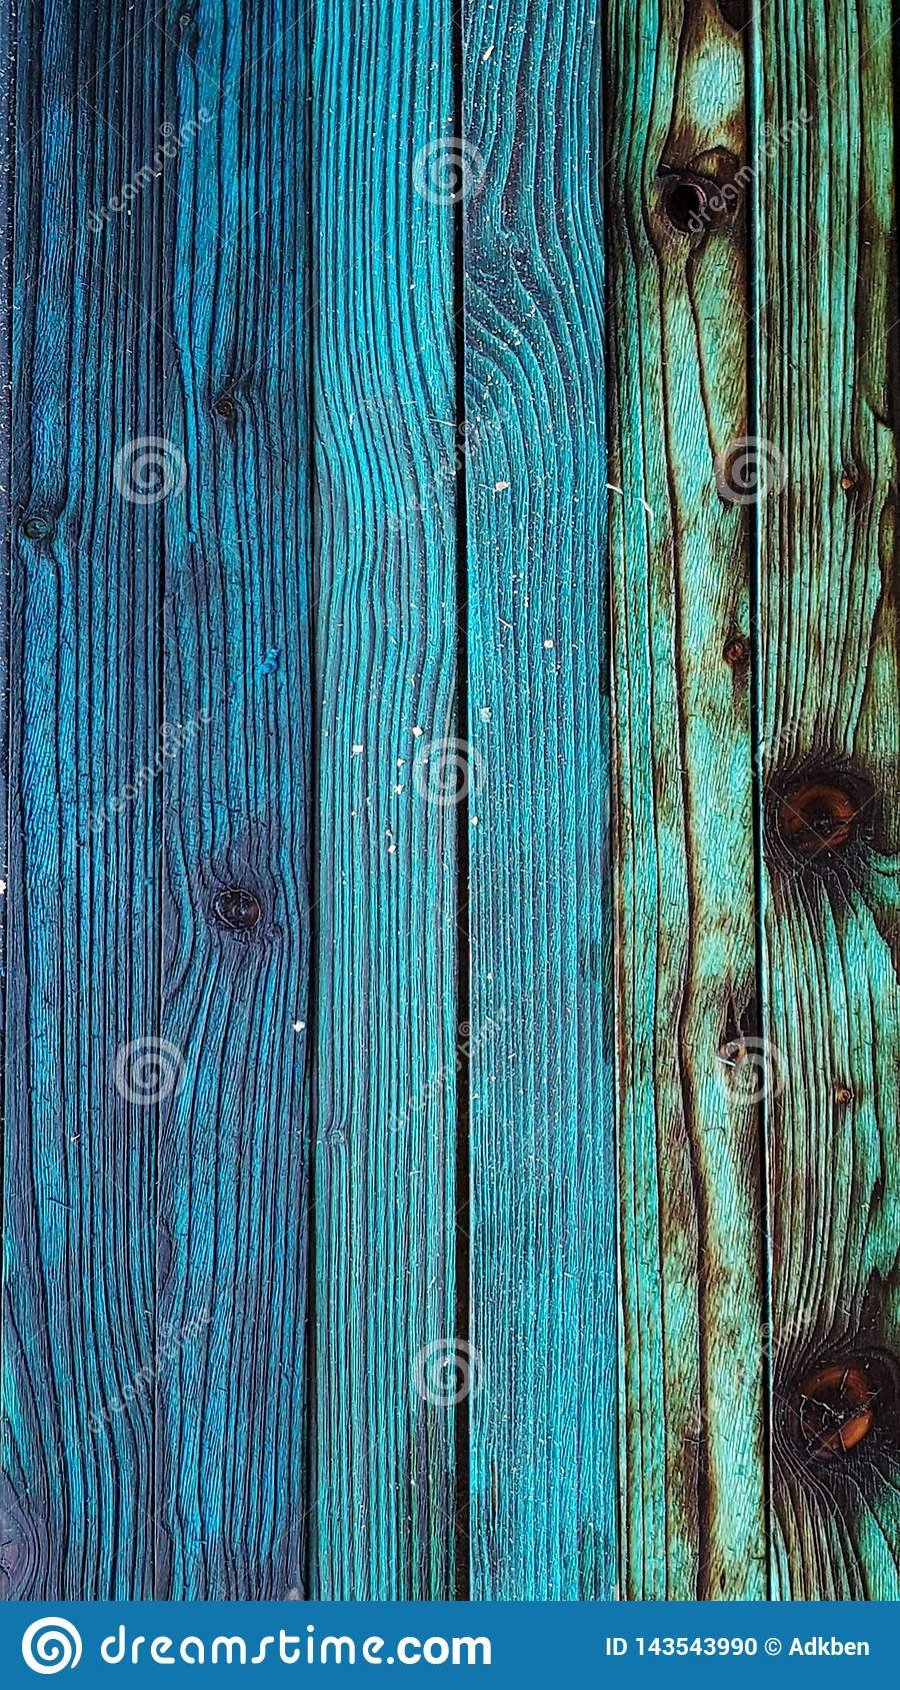 Ombre bleu